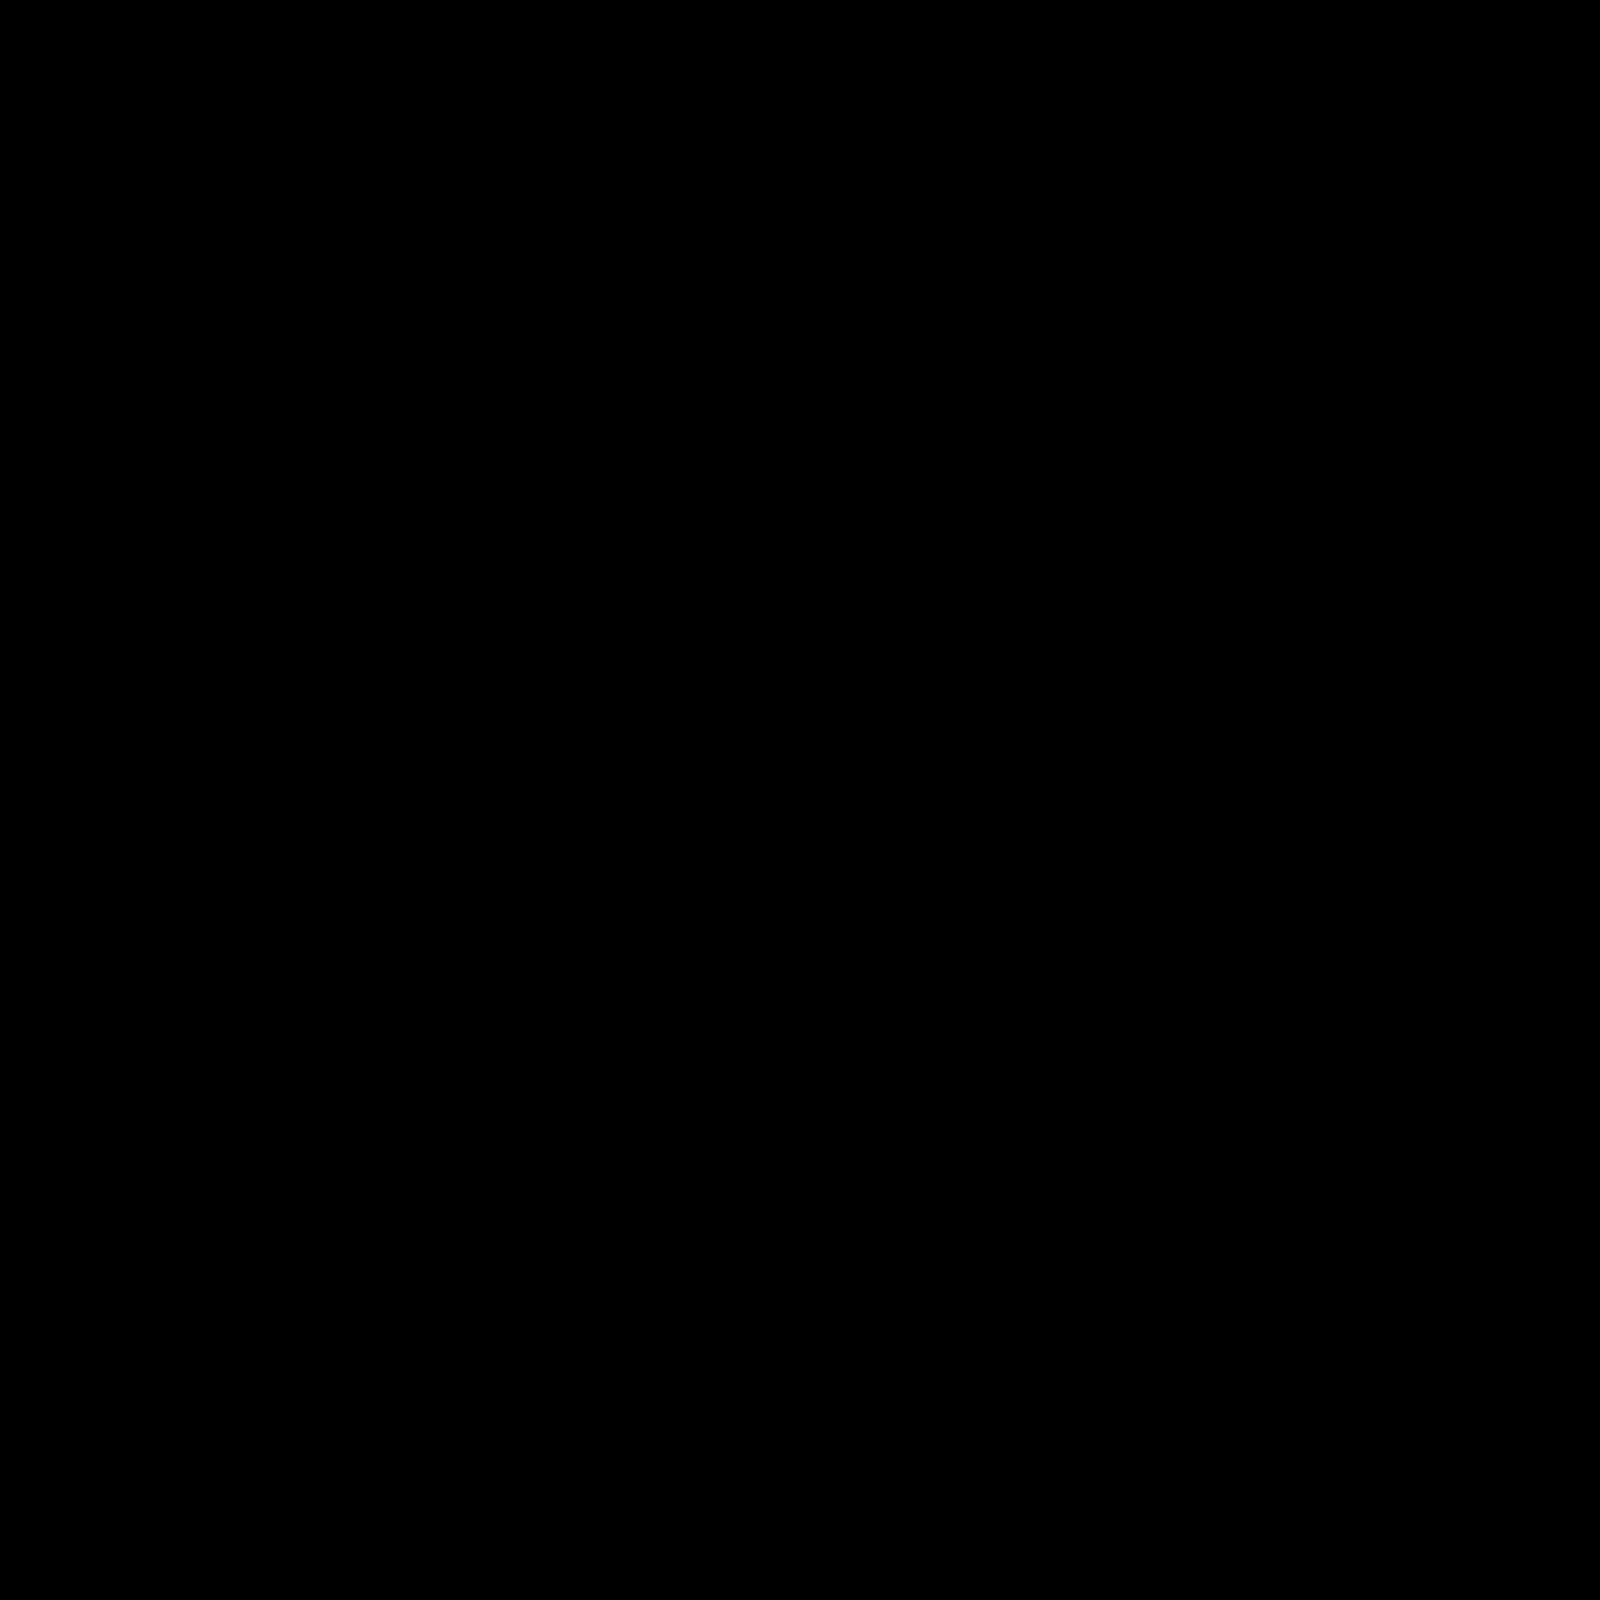 Bewertung icon